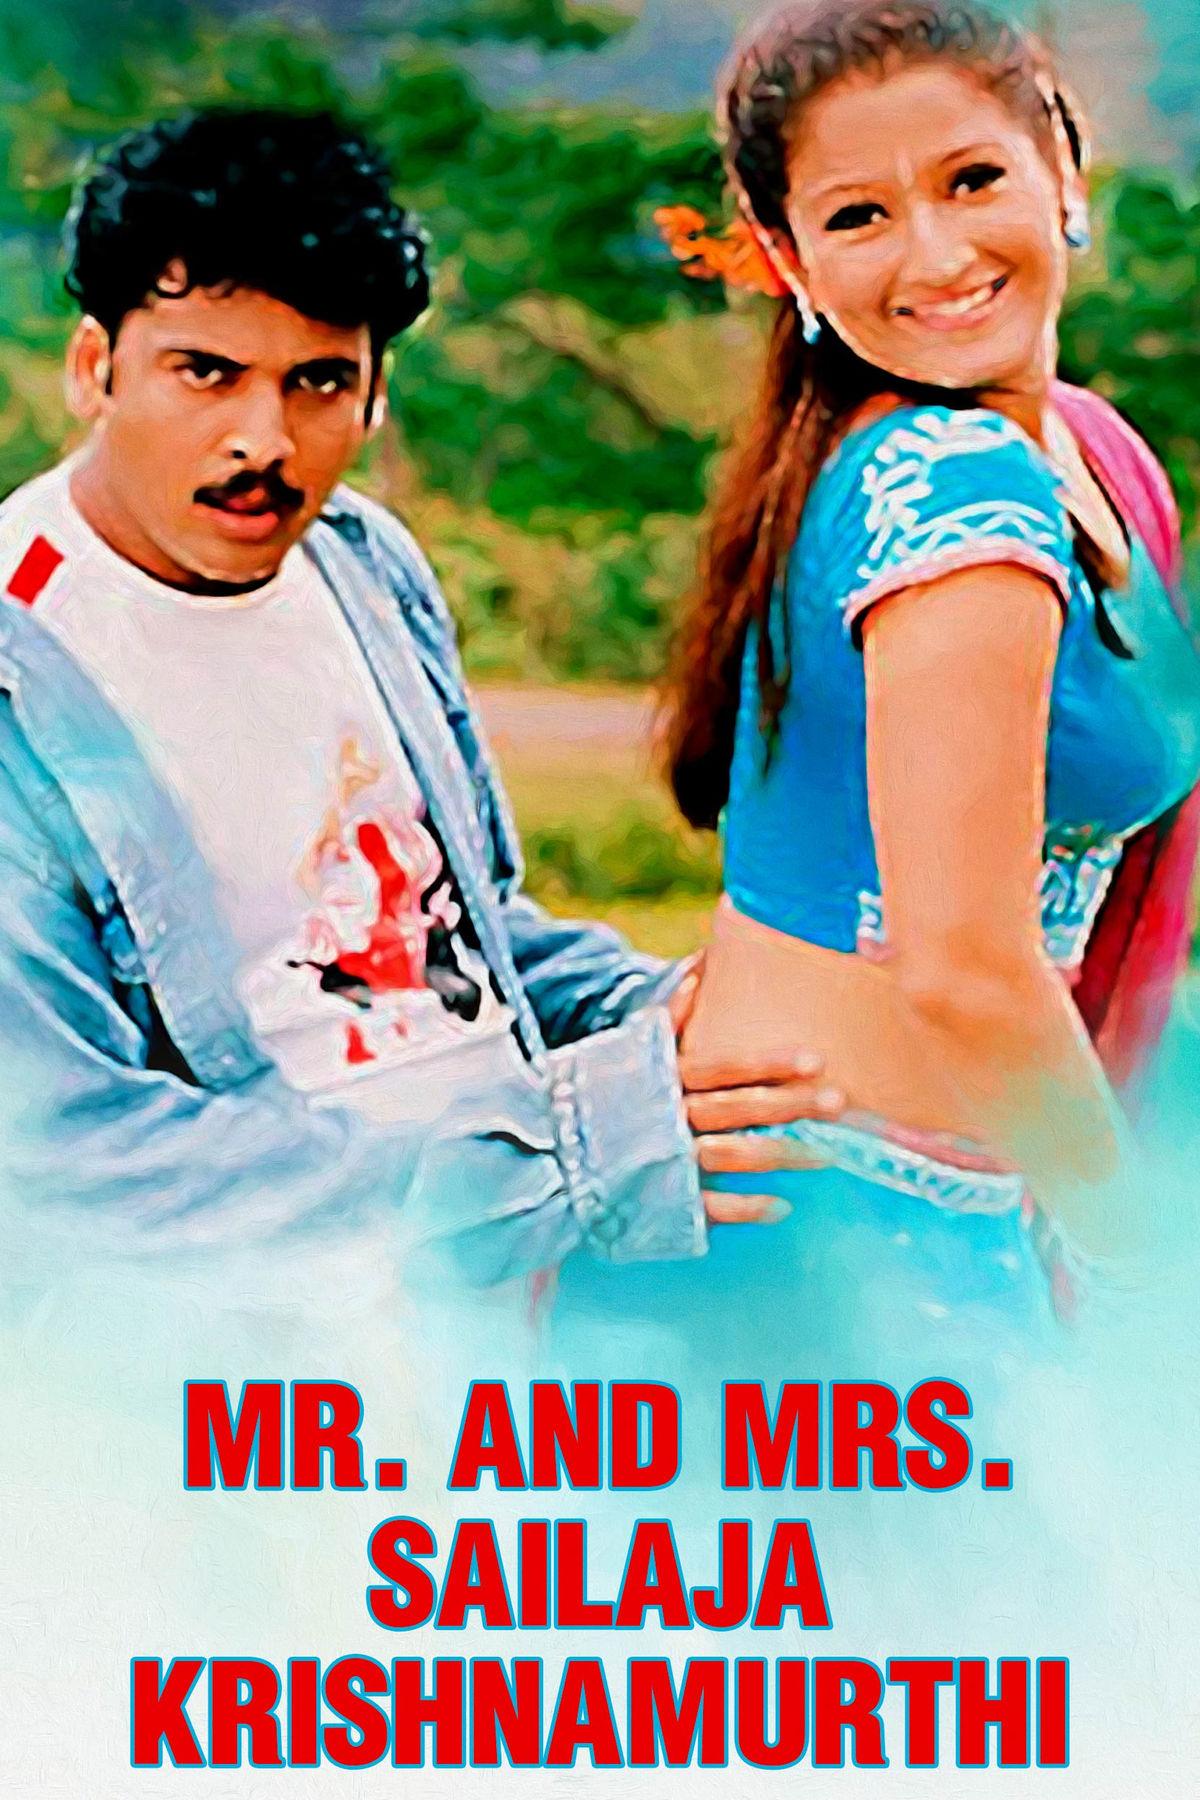 Mr. And Mrs. Sailaja Krishnamurthi